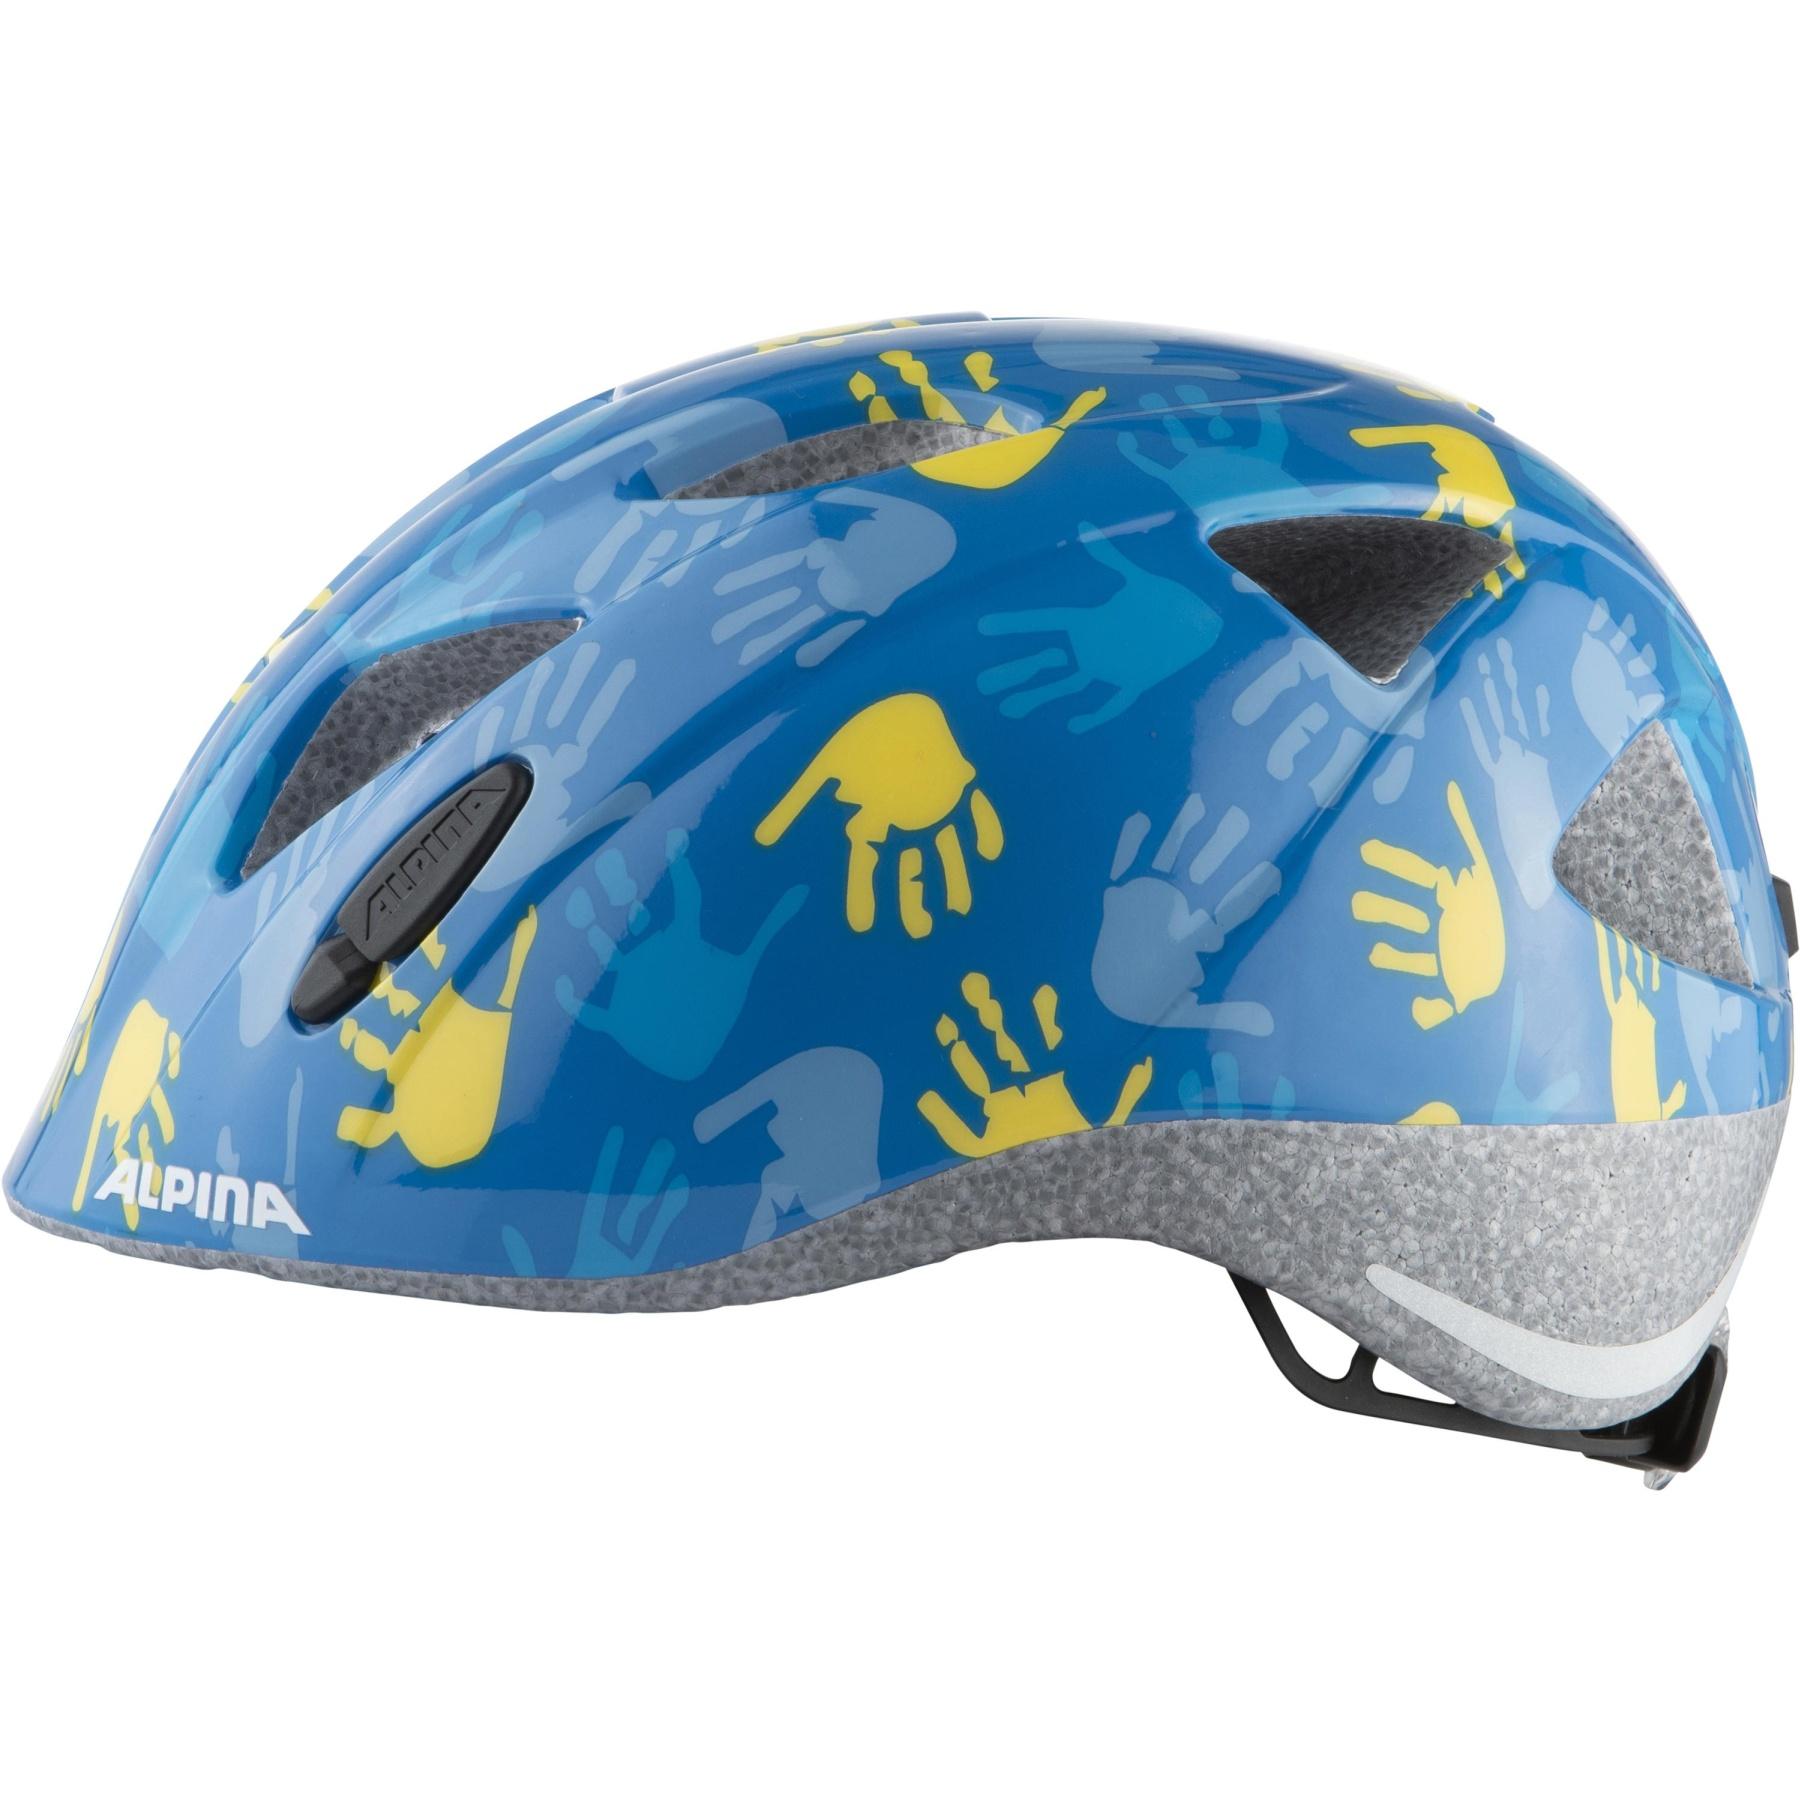 Image of Alpina Ximo Kids Helmet - blue hands gloss